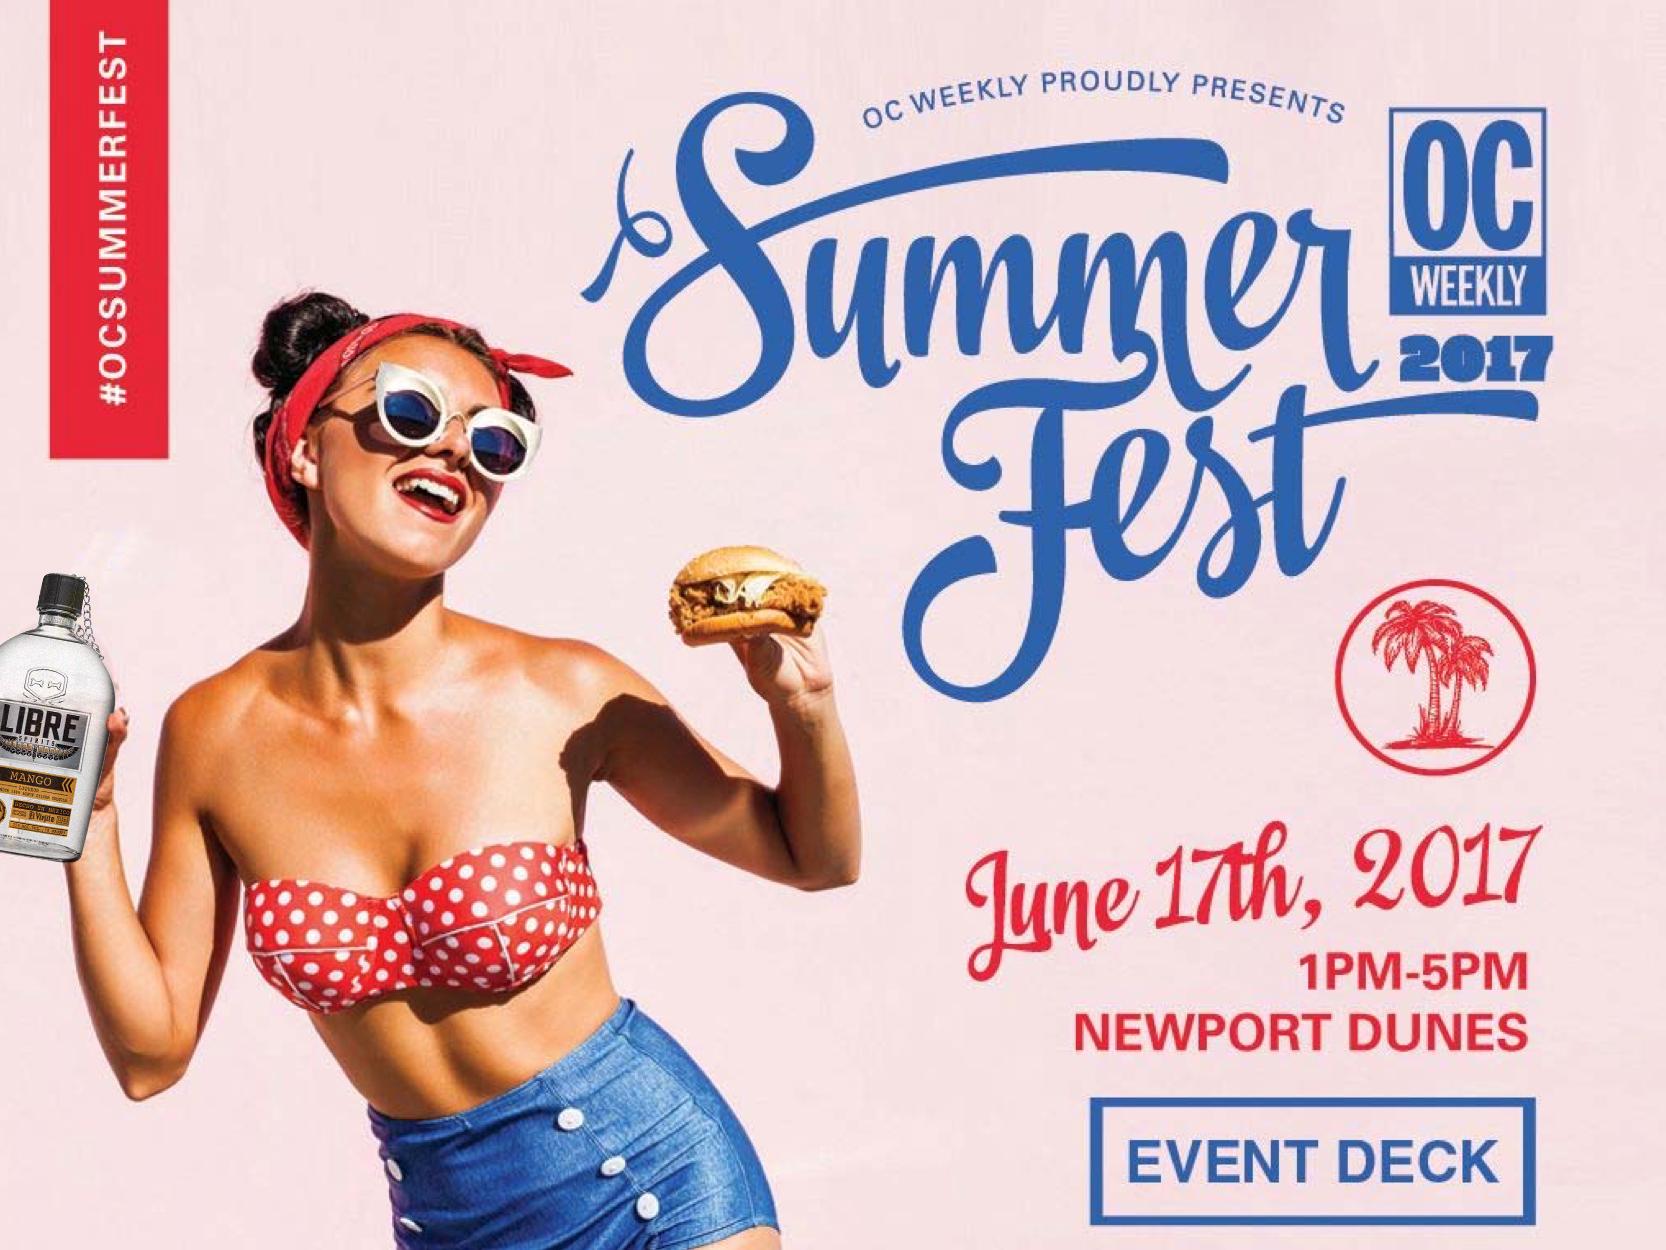 SummerFestFlyer.png